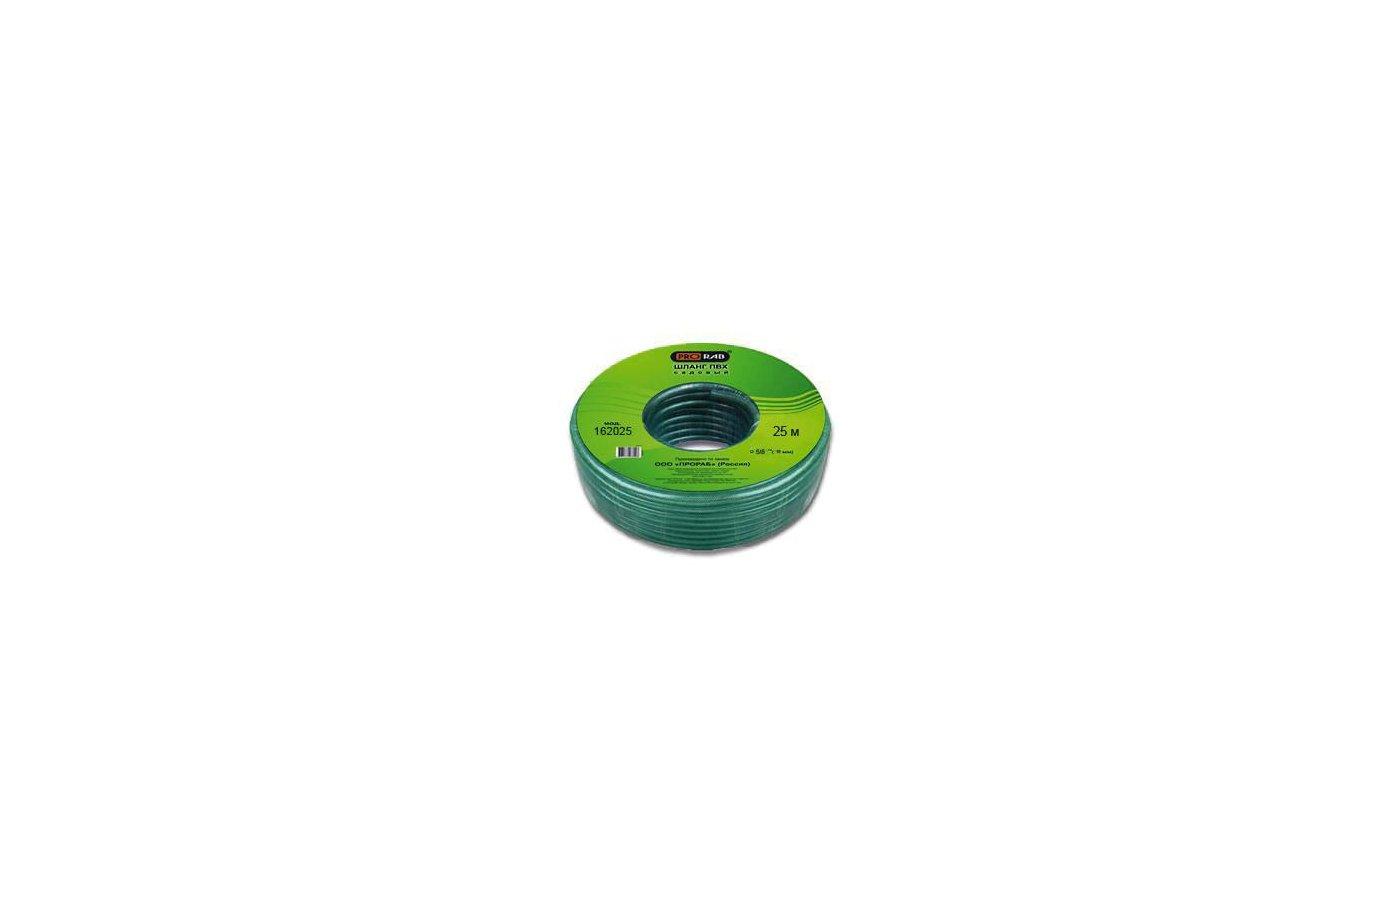 "Поливочное оборудование Prorab 162025  Шланг ПВХ для полива, диаметр 5/8"", 25 м  Hobby"